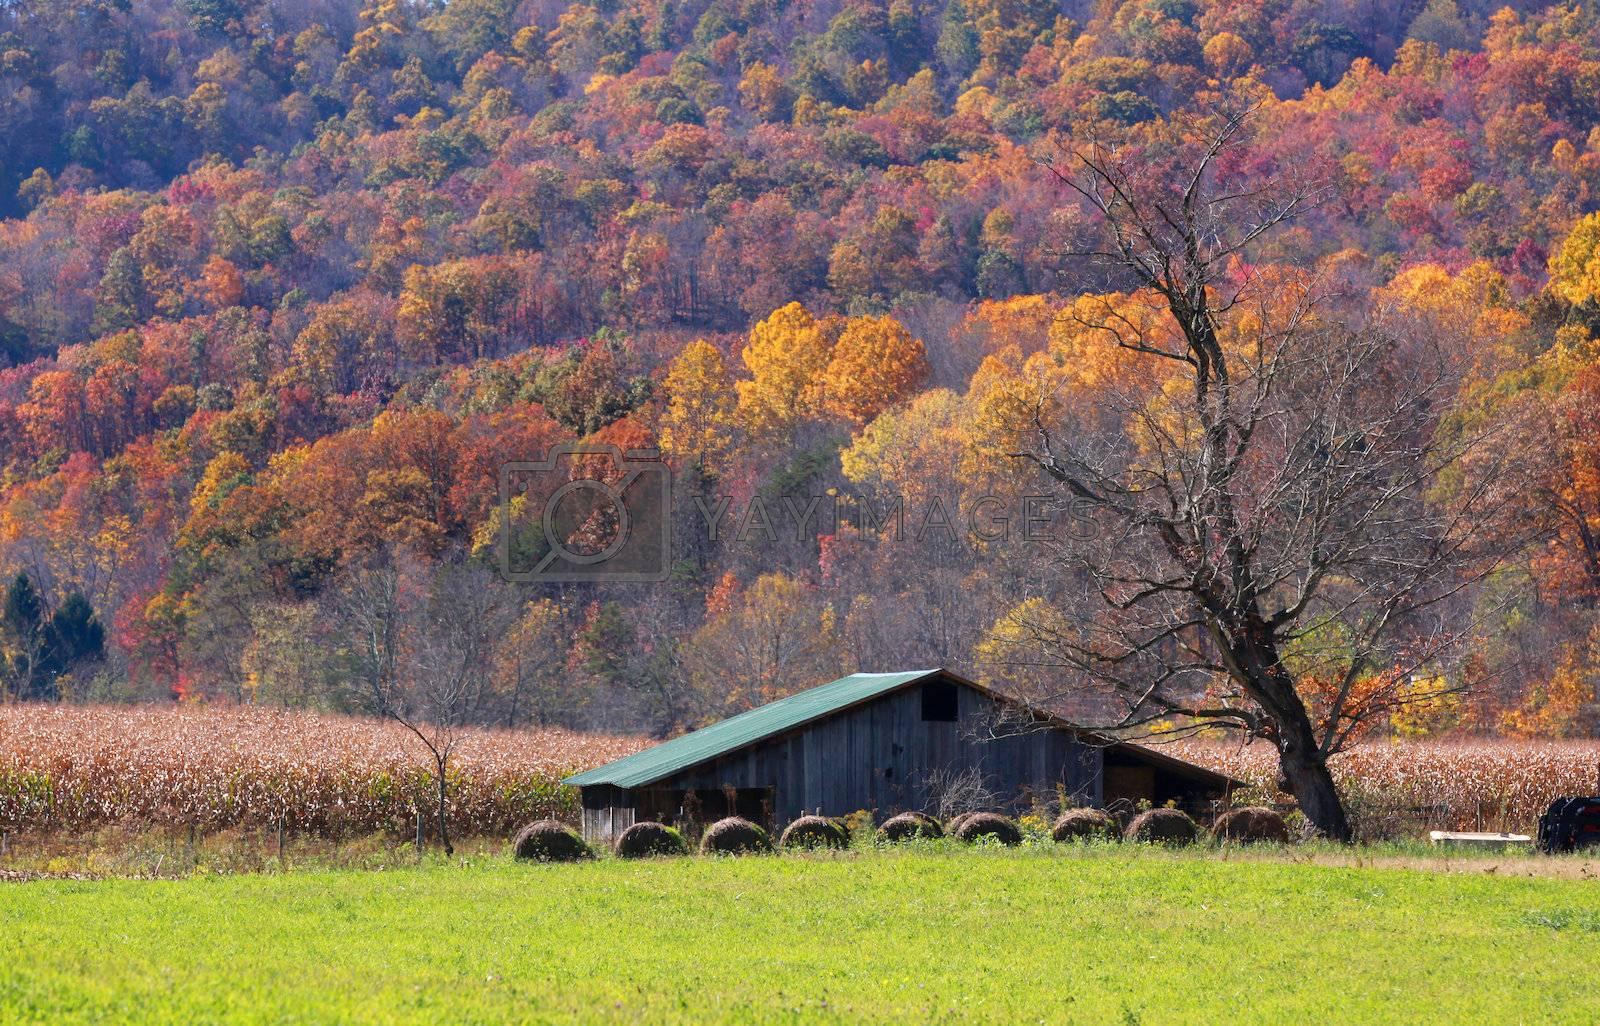 Farm lands in Appalachian mountains of West Virginia